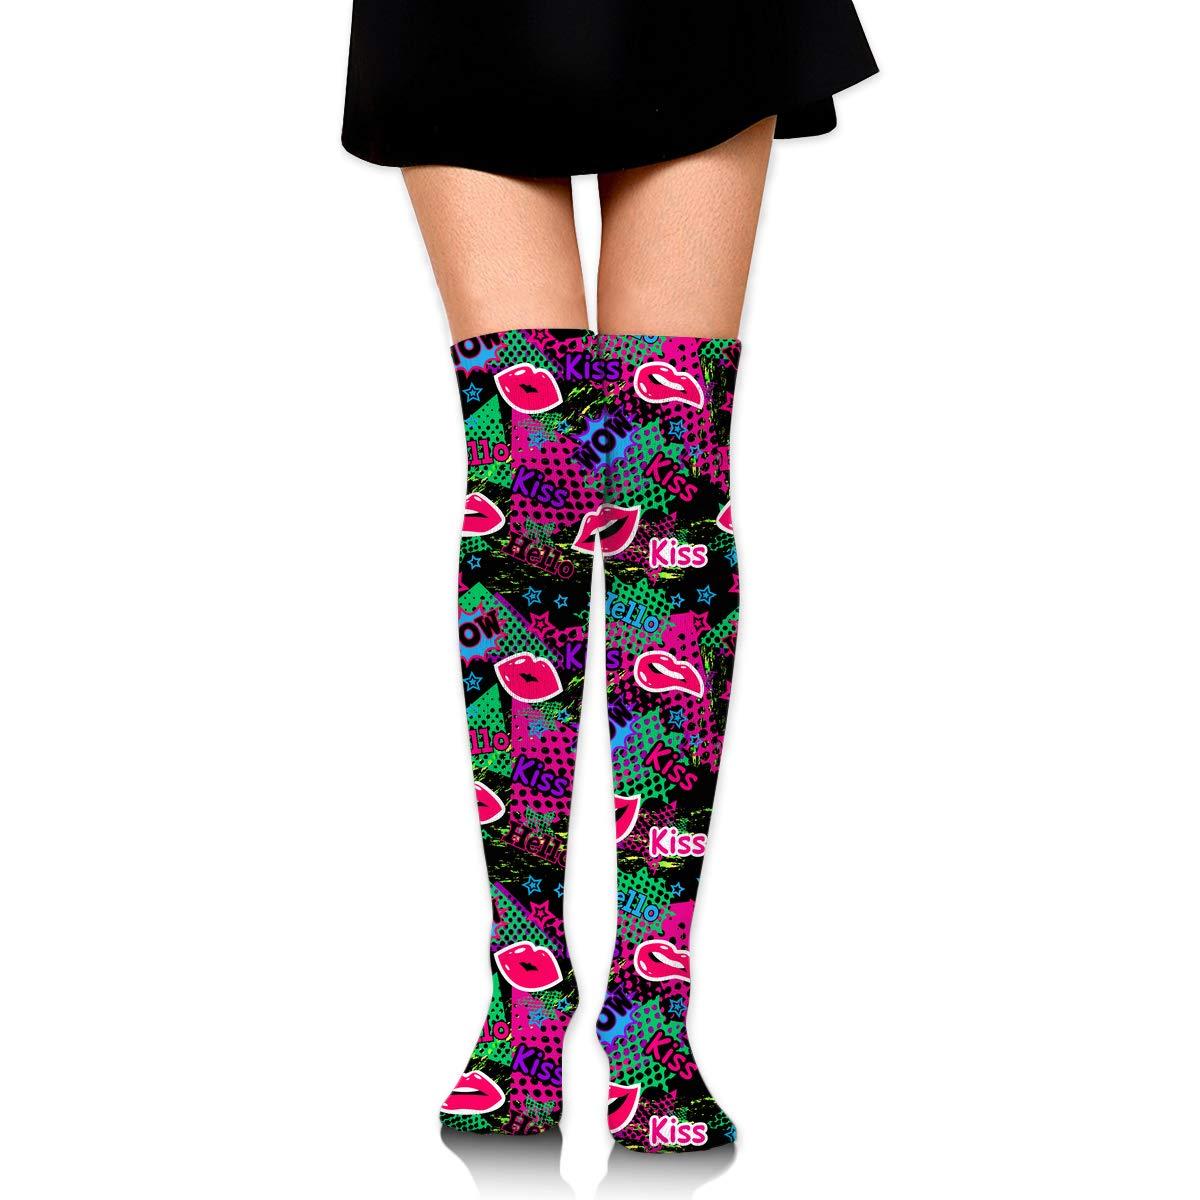 Womens//Girls Comic Graffiti Art Casual Socks Yoga Socks Over The Knee High Socks 23.6